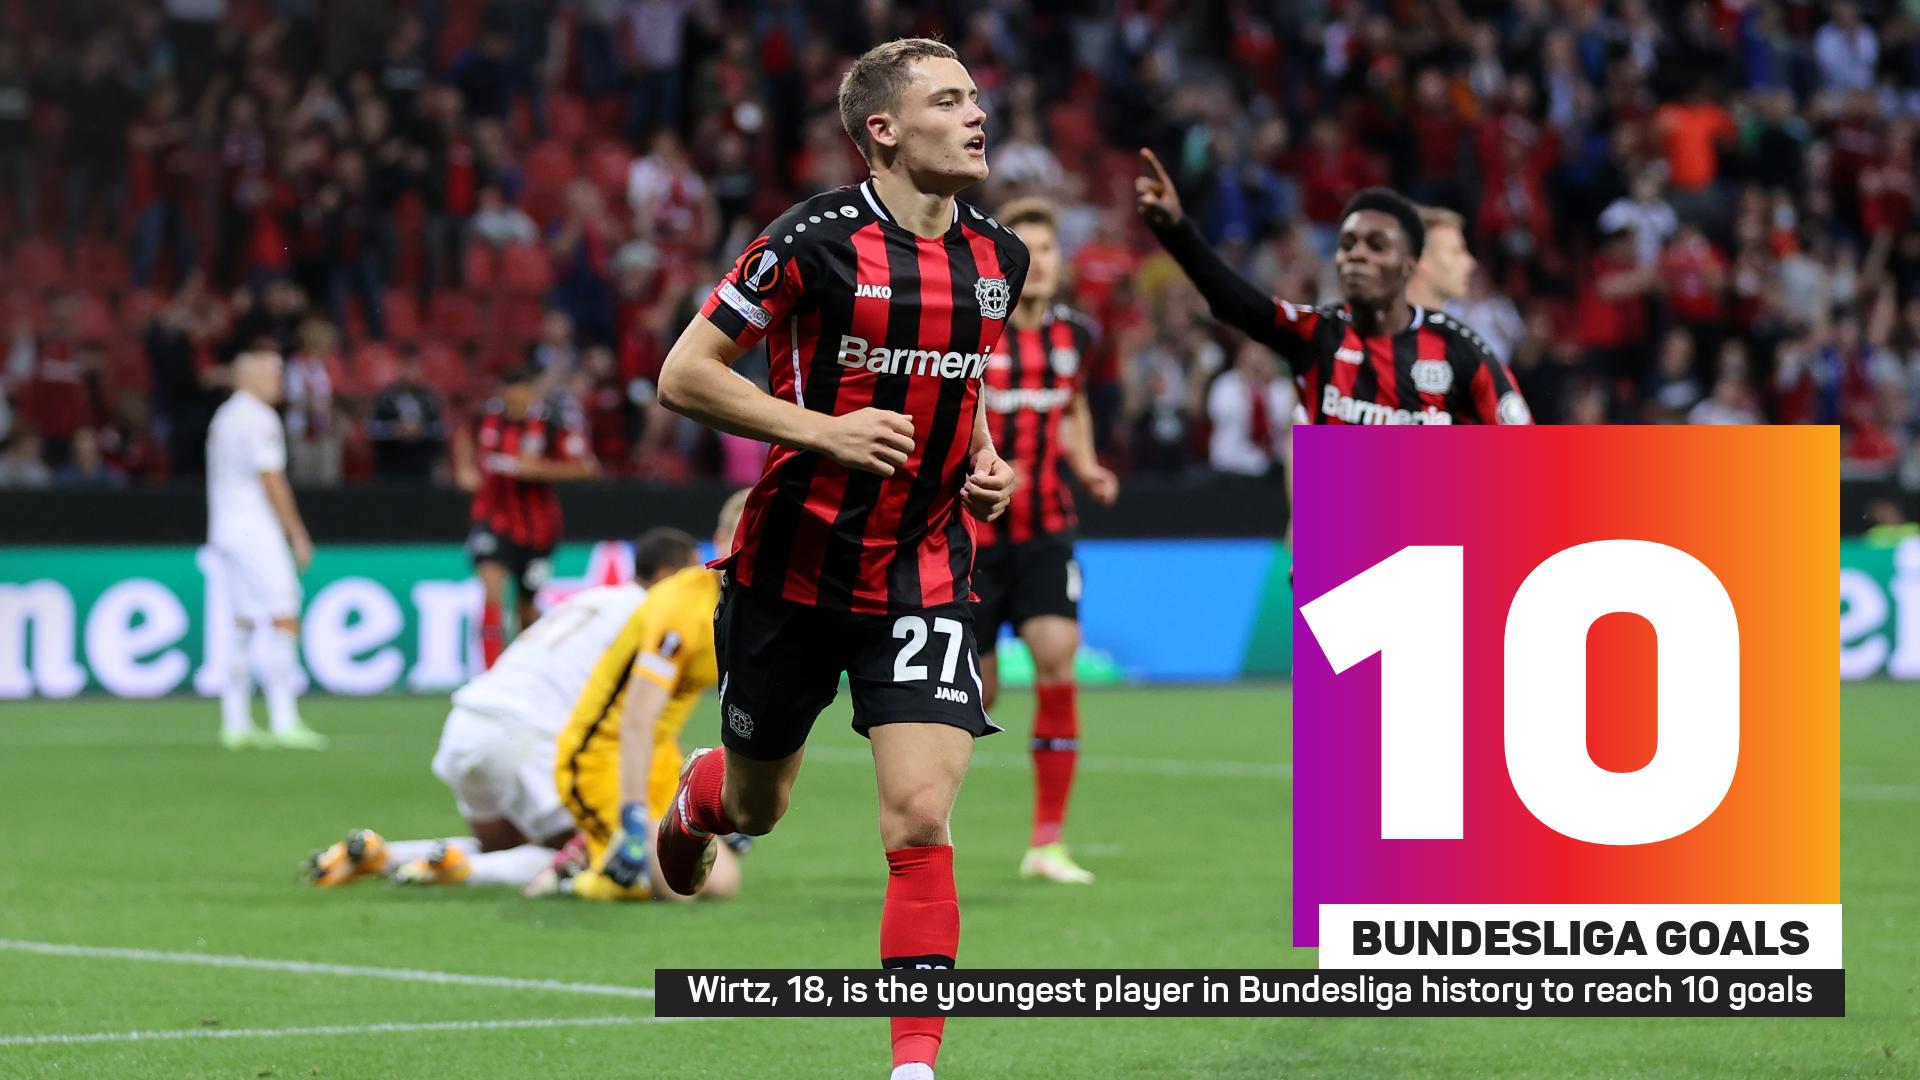 Florian Wirtz Bundesliga goals